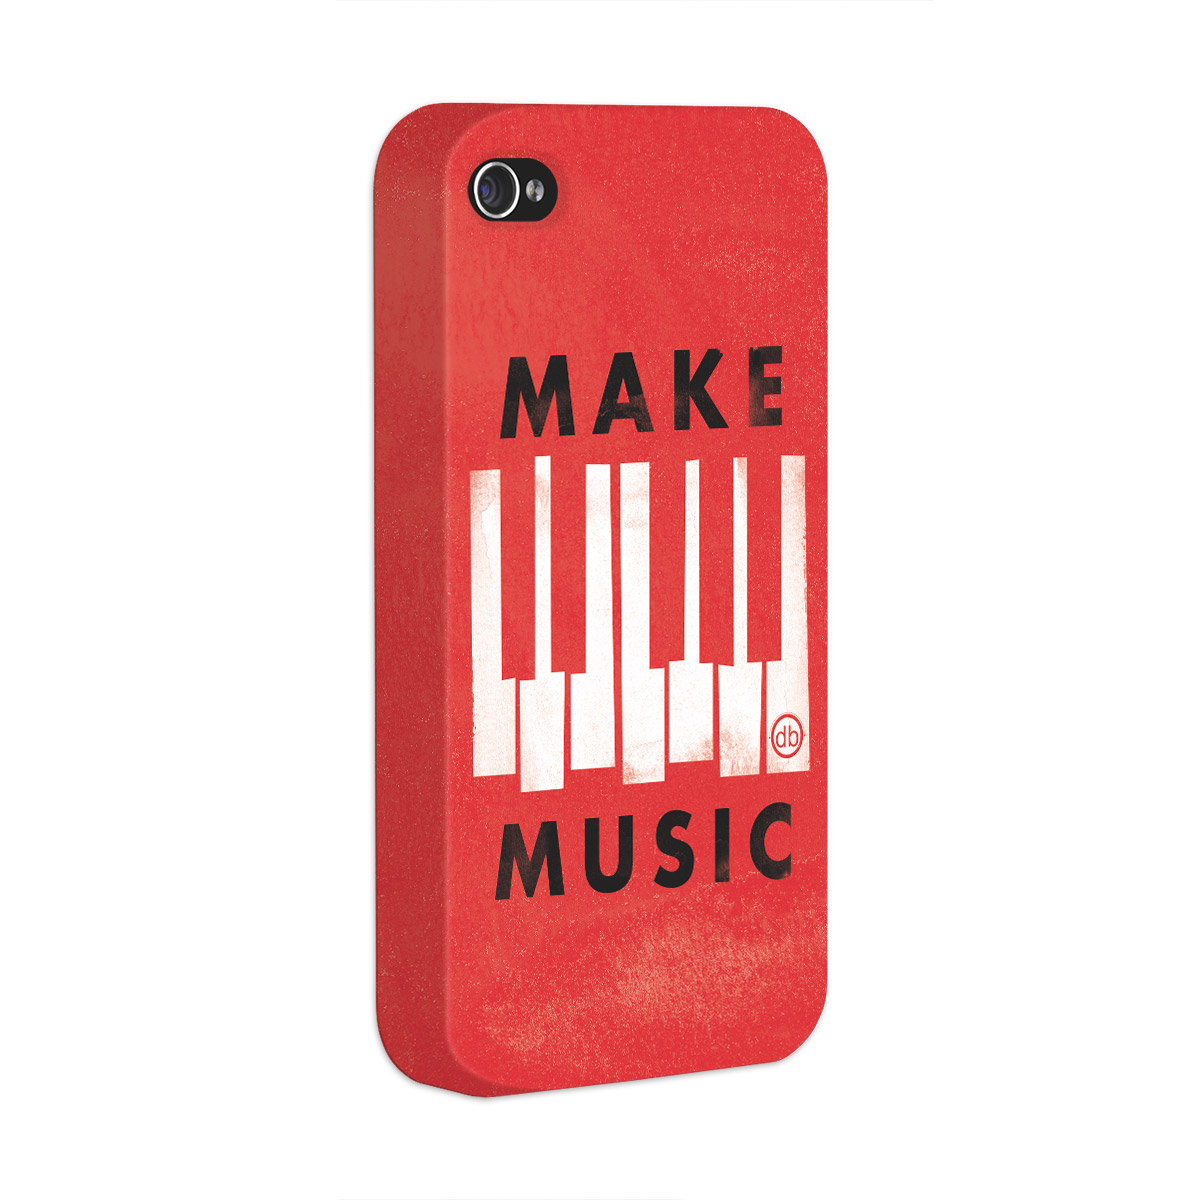 Capa para iPhone 4/4S Dudu Borges Make Music